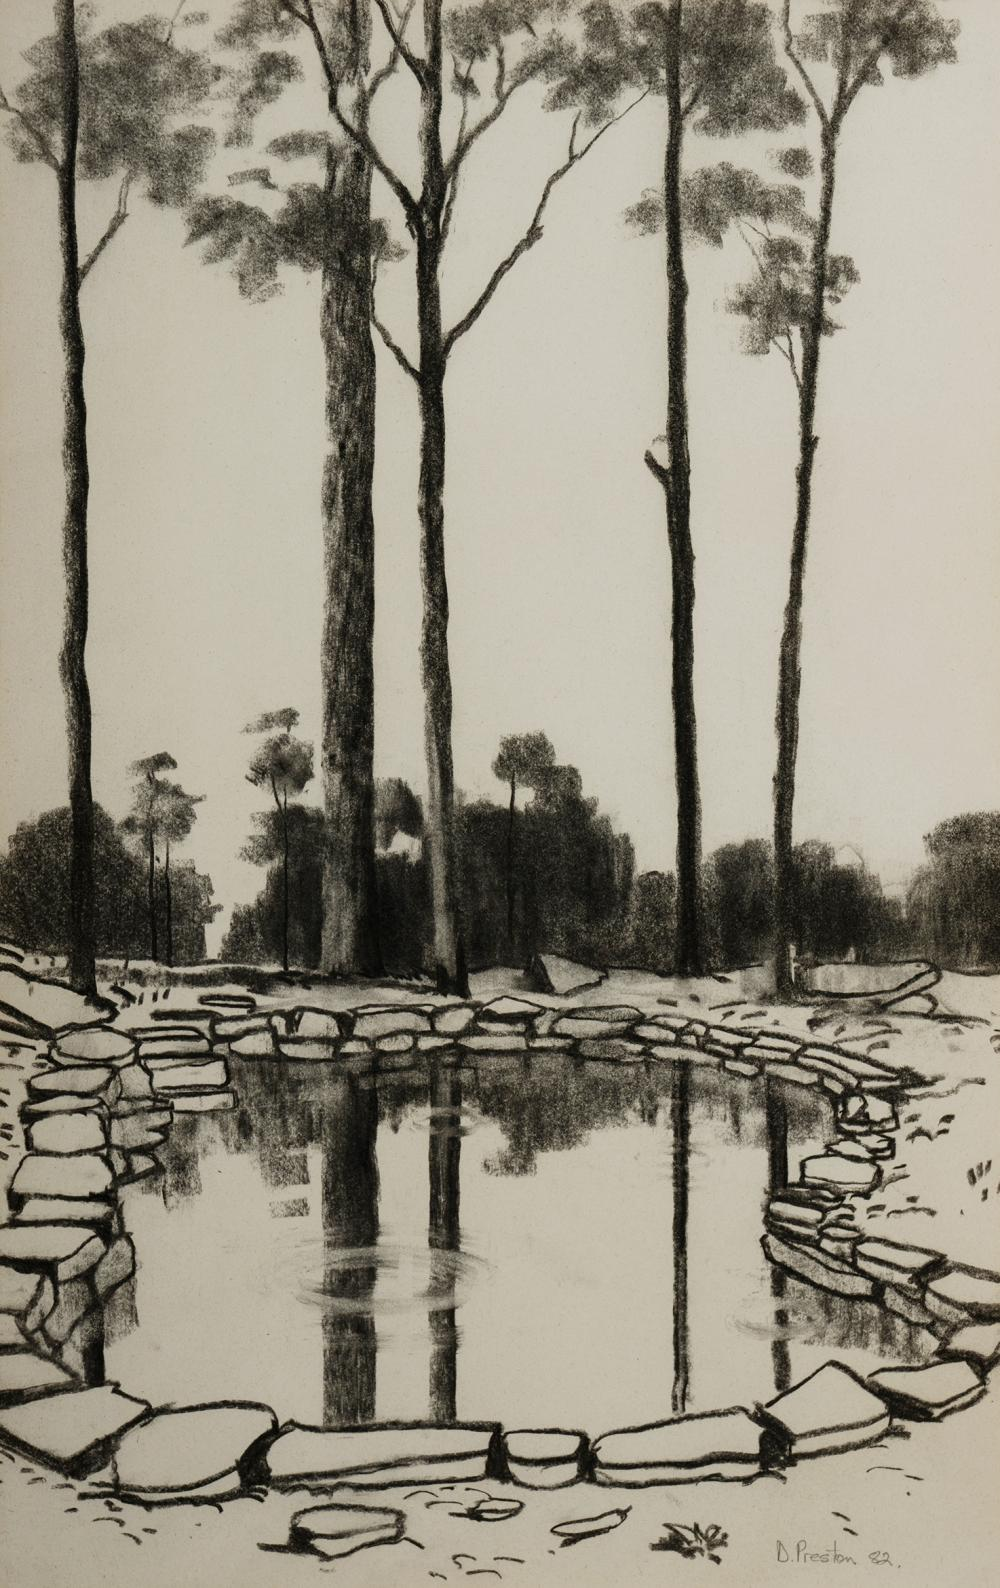 PRESTON David (b.1948), Rock Pool, 1982., Charcoal, 57x36cm